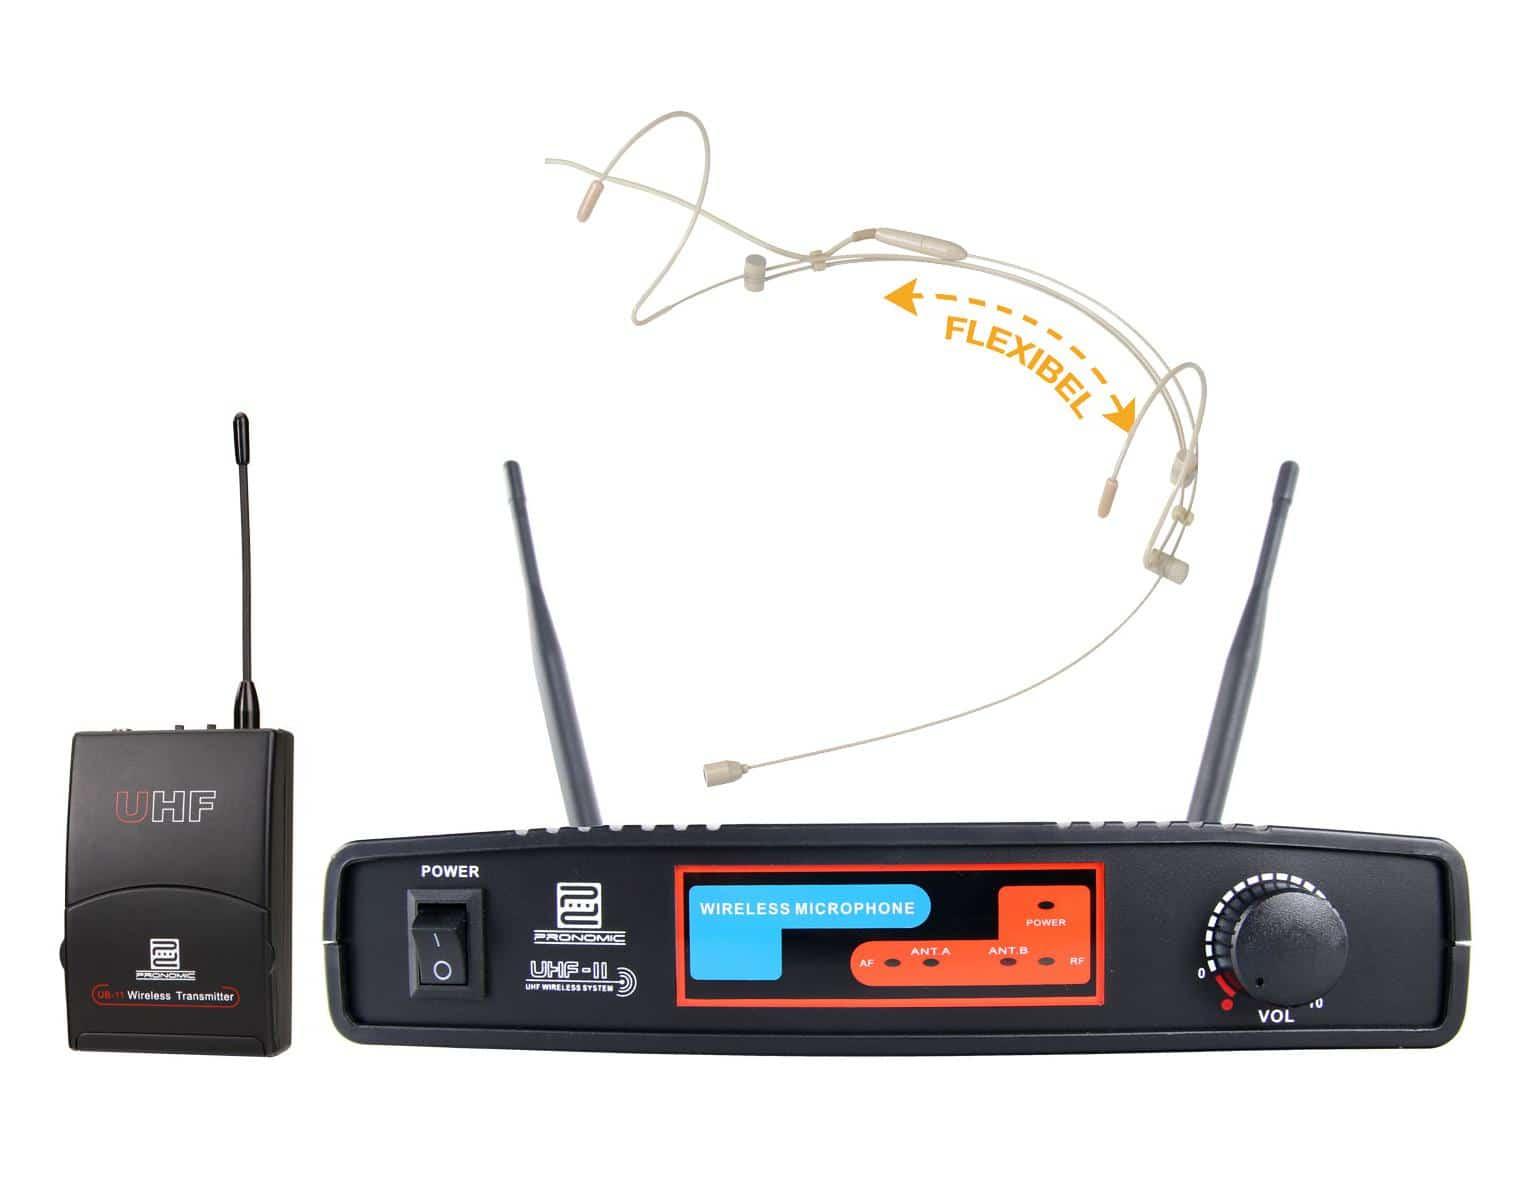 Pronomic UBF 11 Pro Sport XT Funkset (Headset) K9